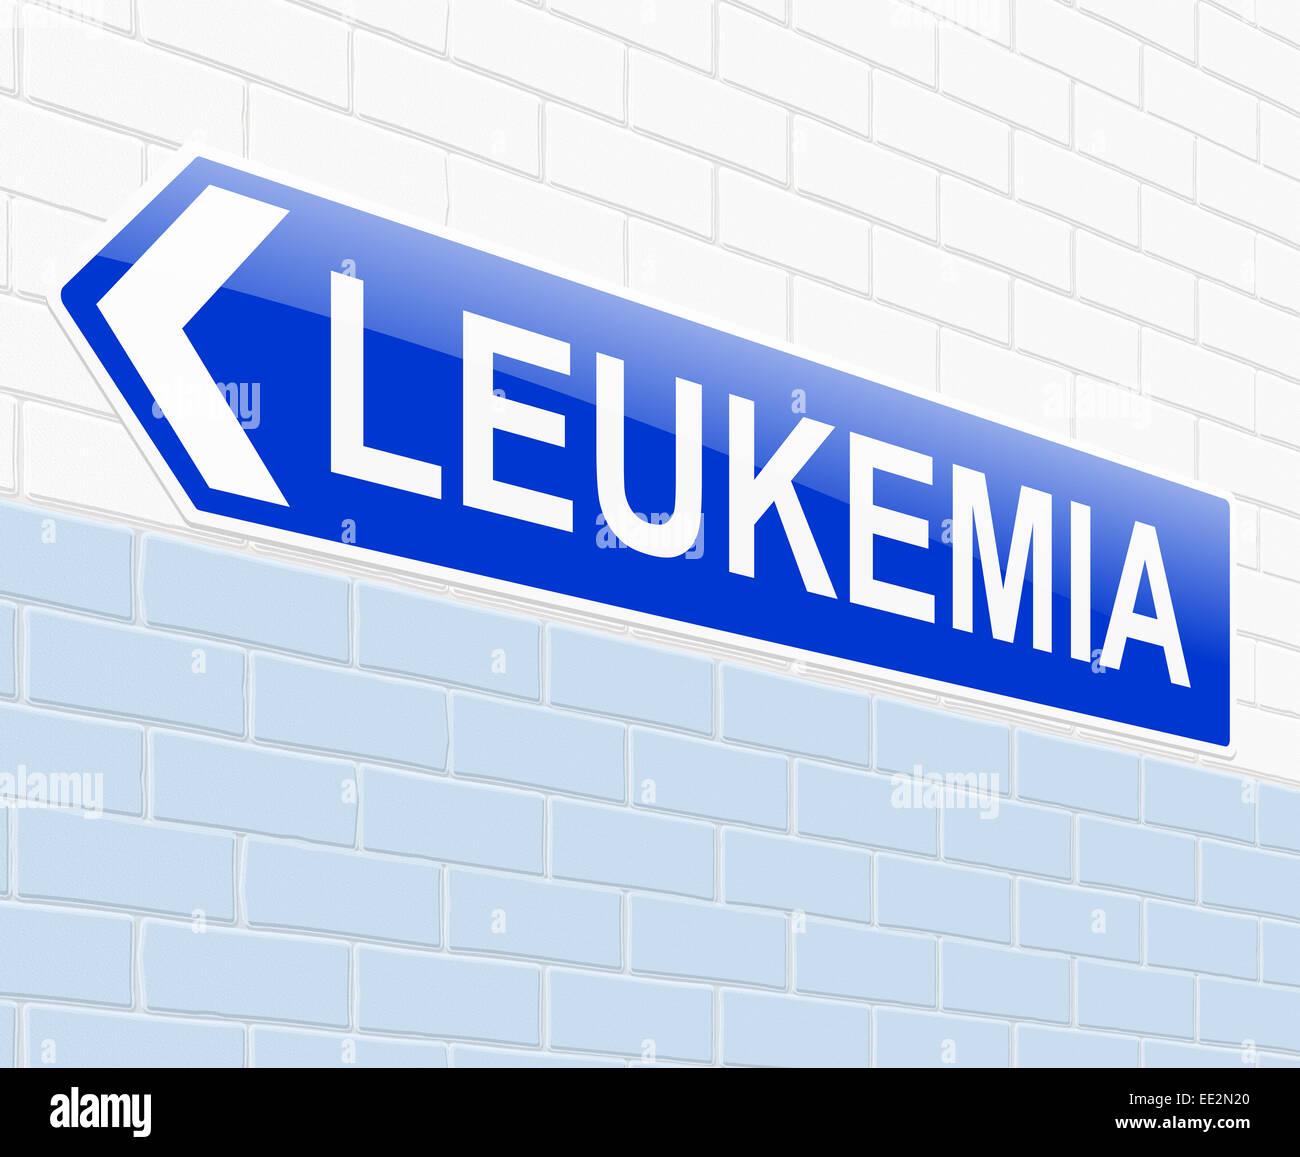 Leukemia concept. - Stock Image